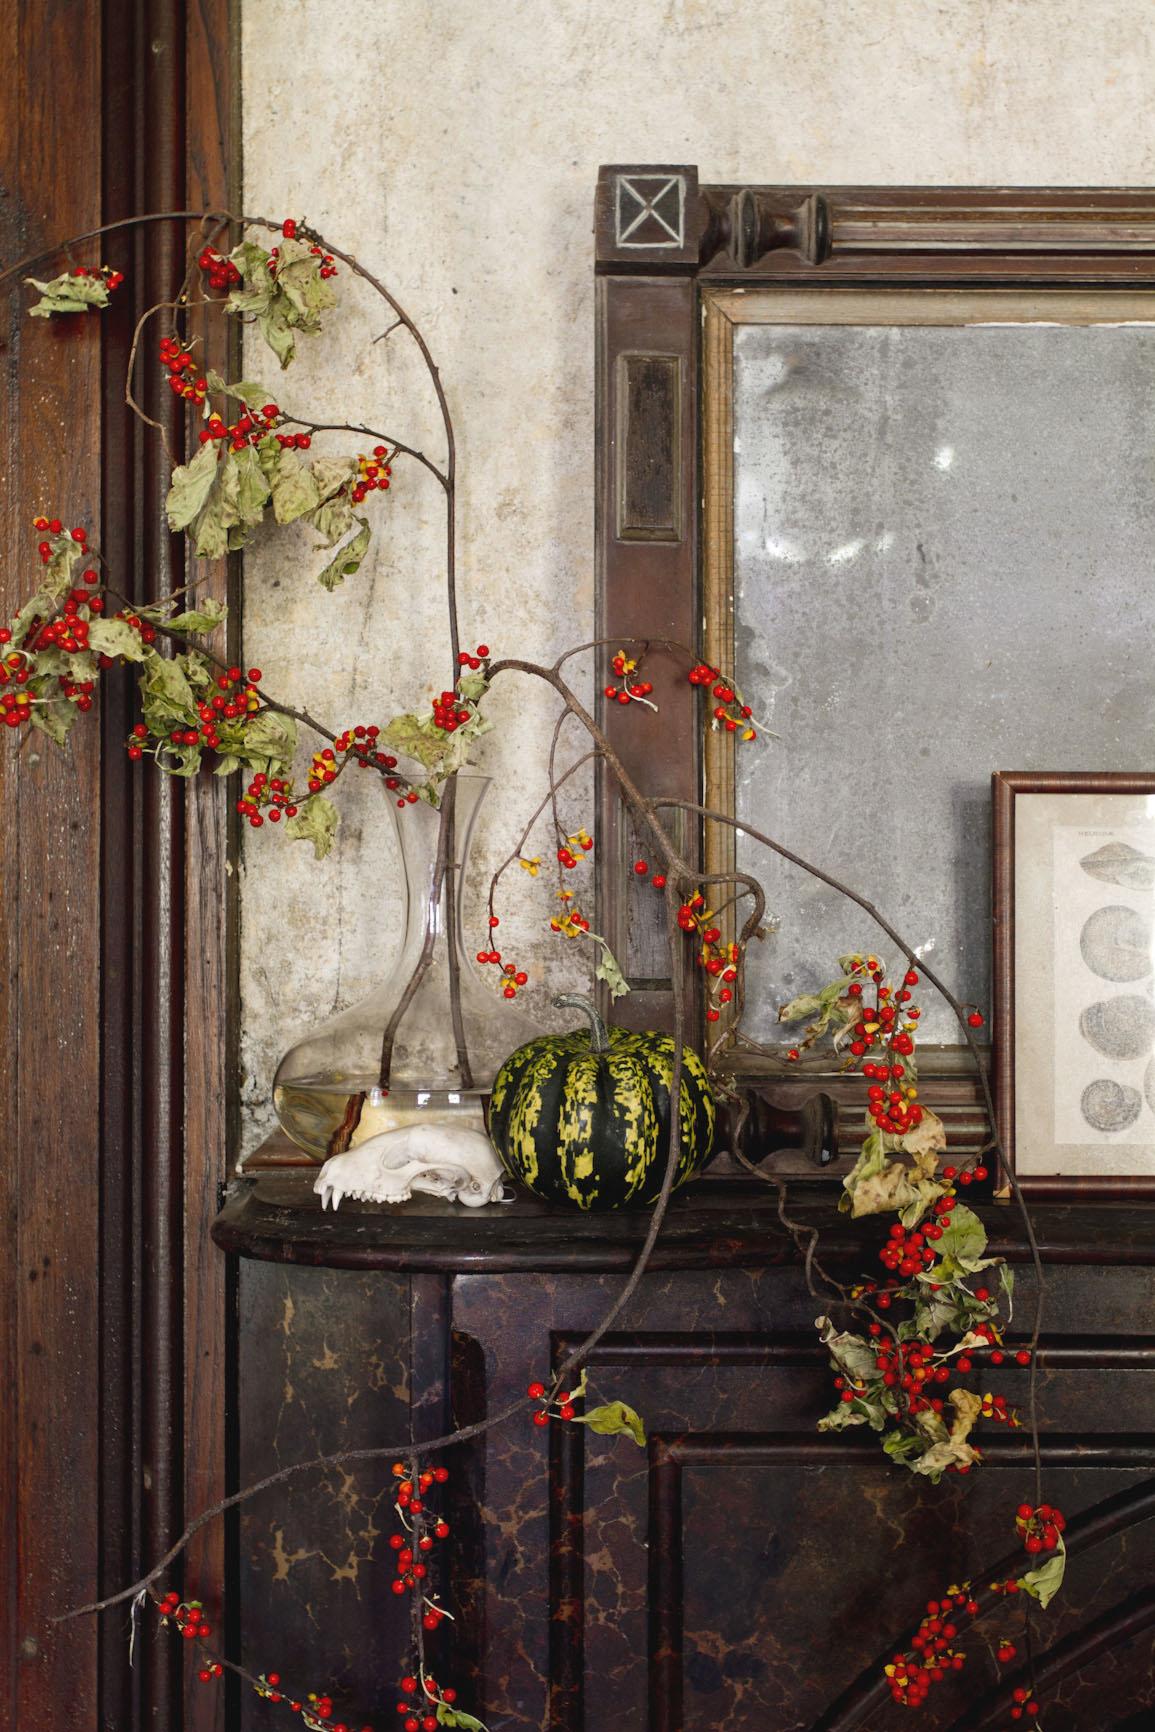 autumn-lifestyle-mantle-bittersweet-interior-photography.jpg